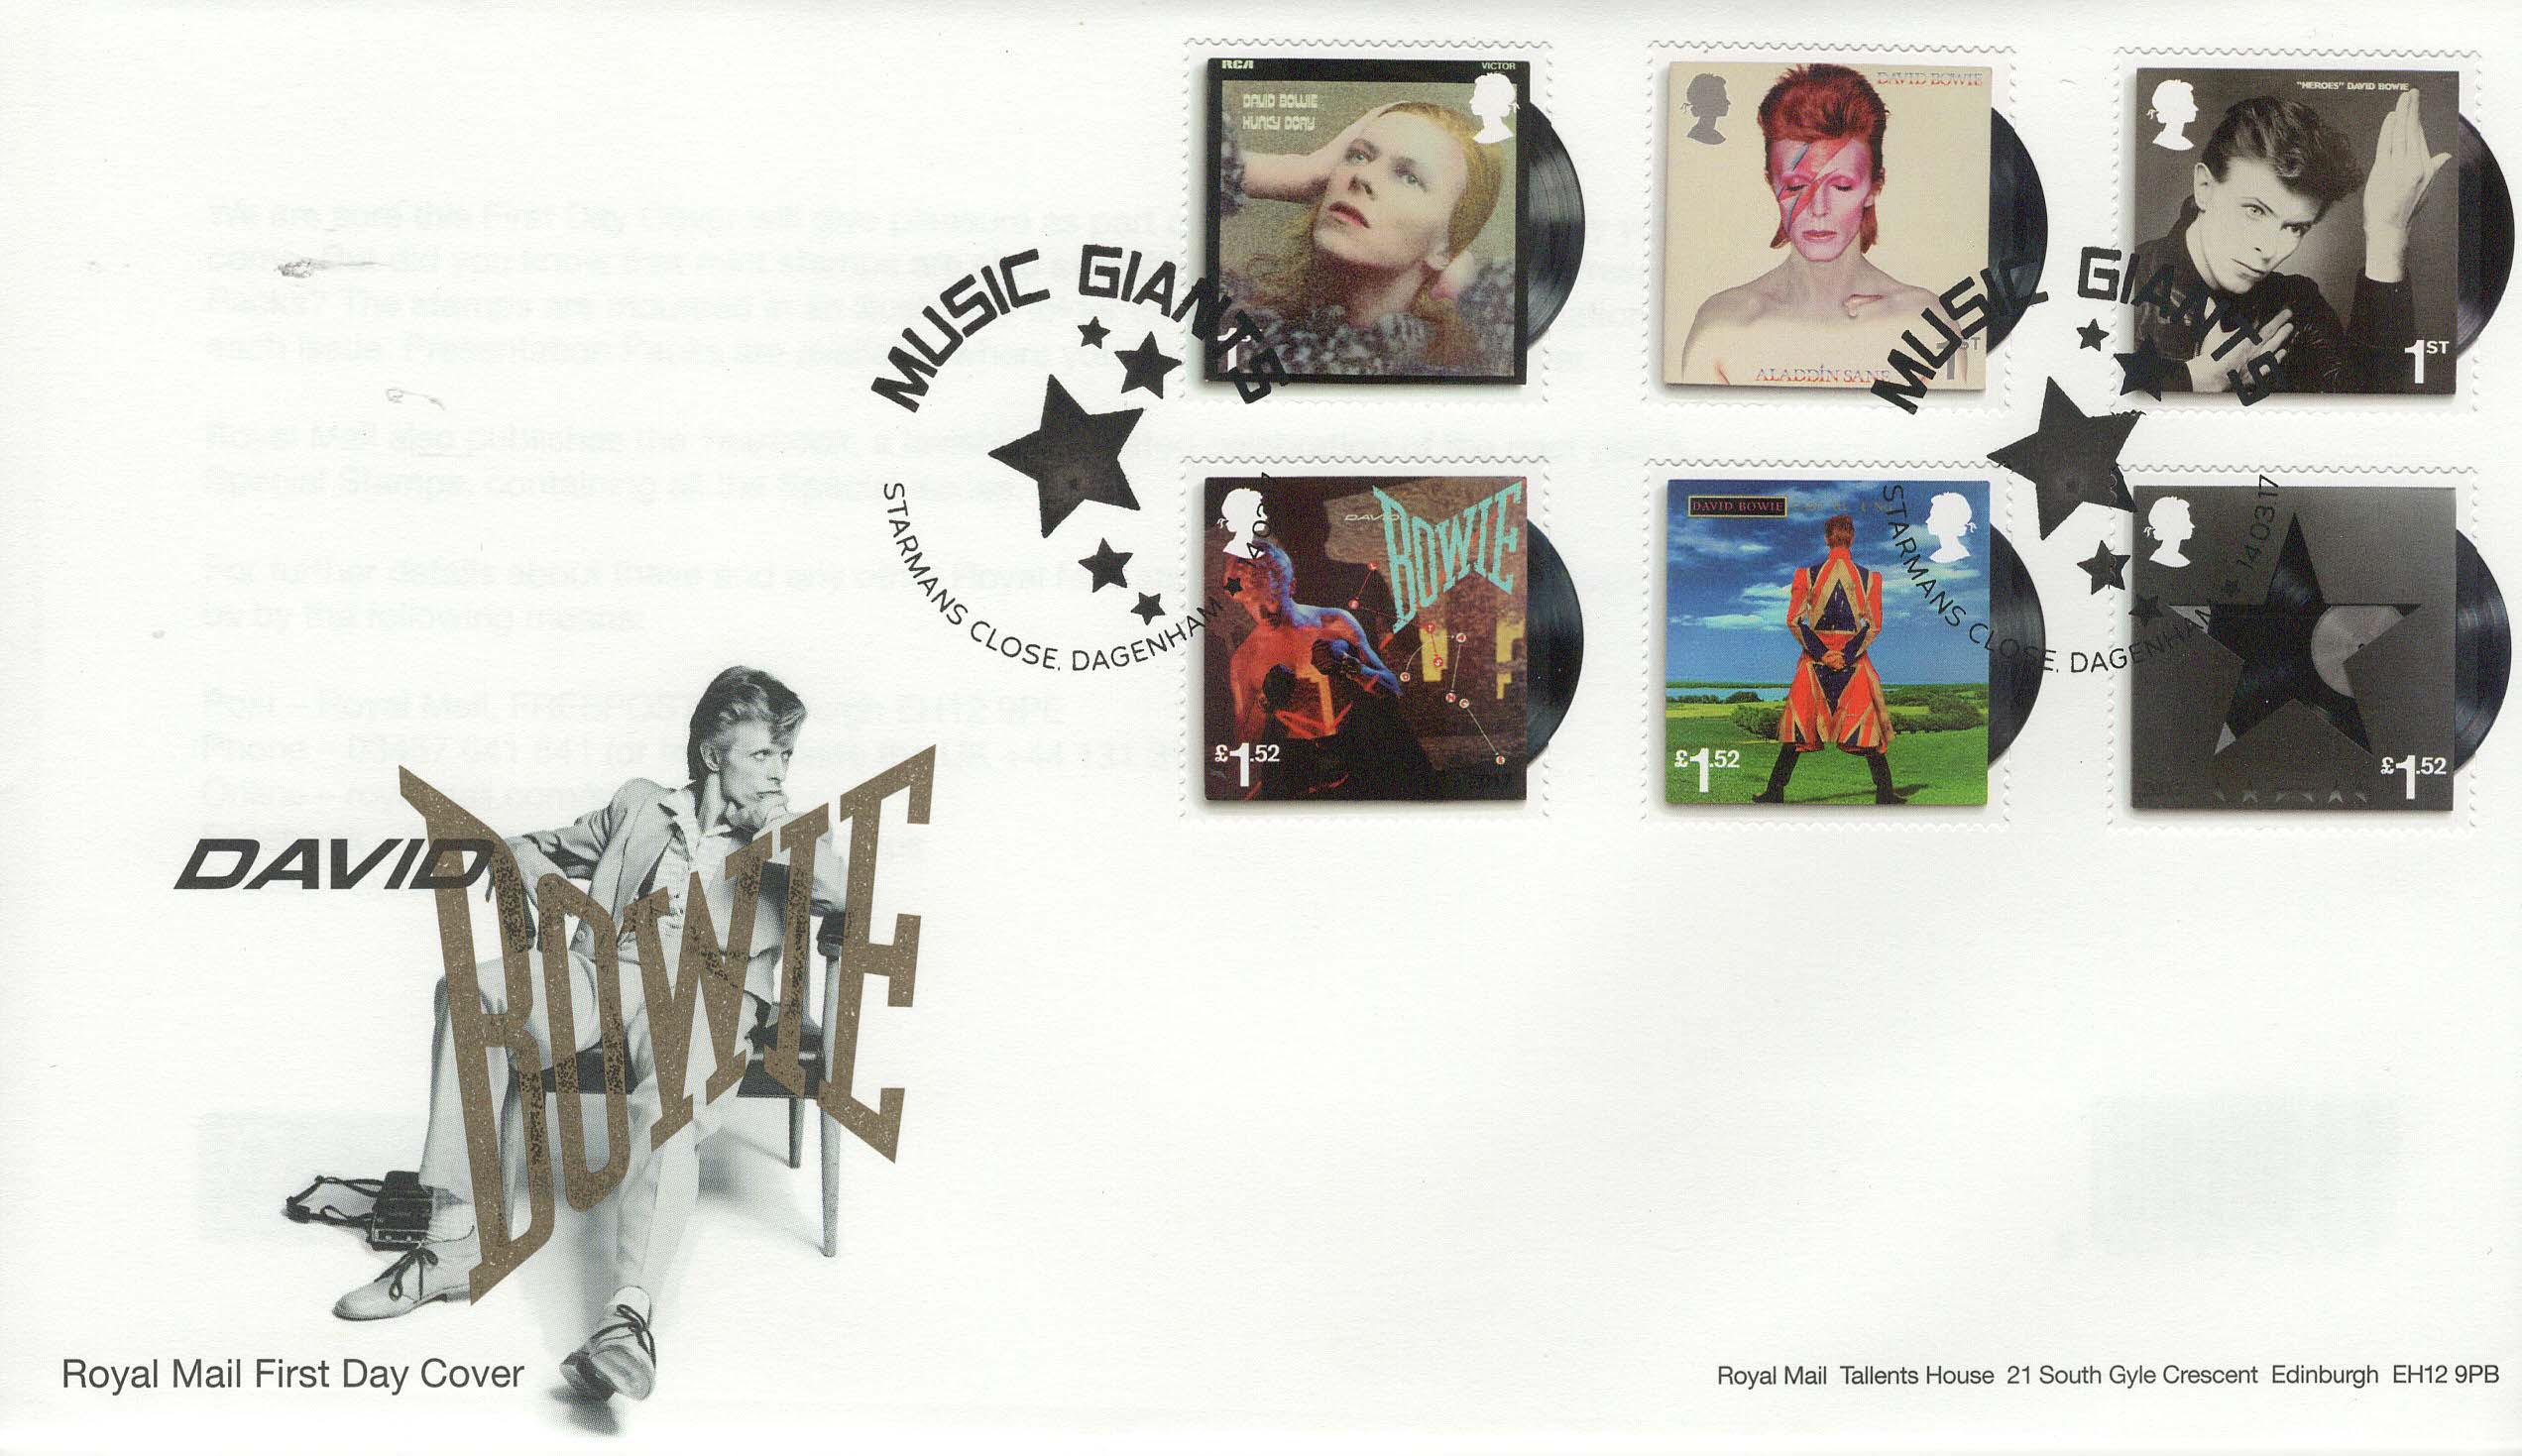 RM-David-Bowie-FDC-Mar-2017